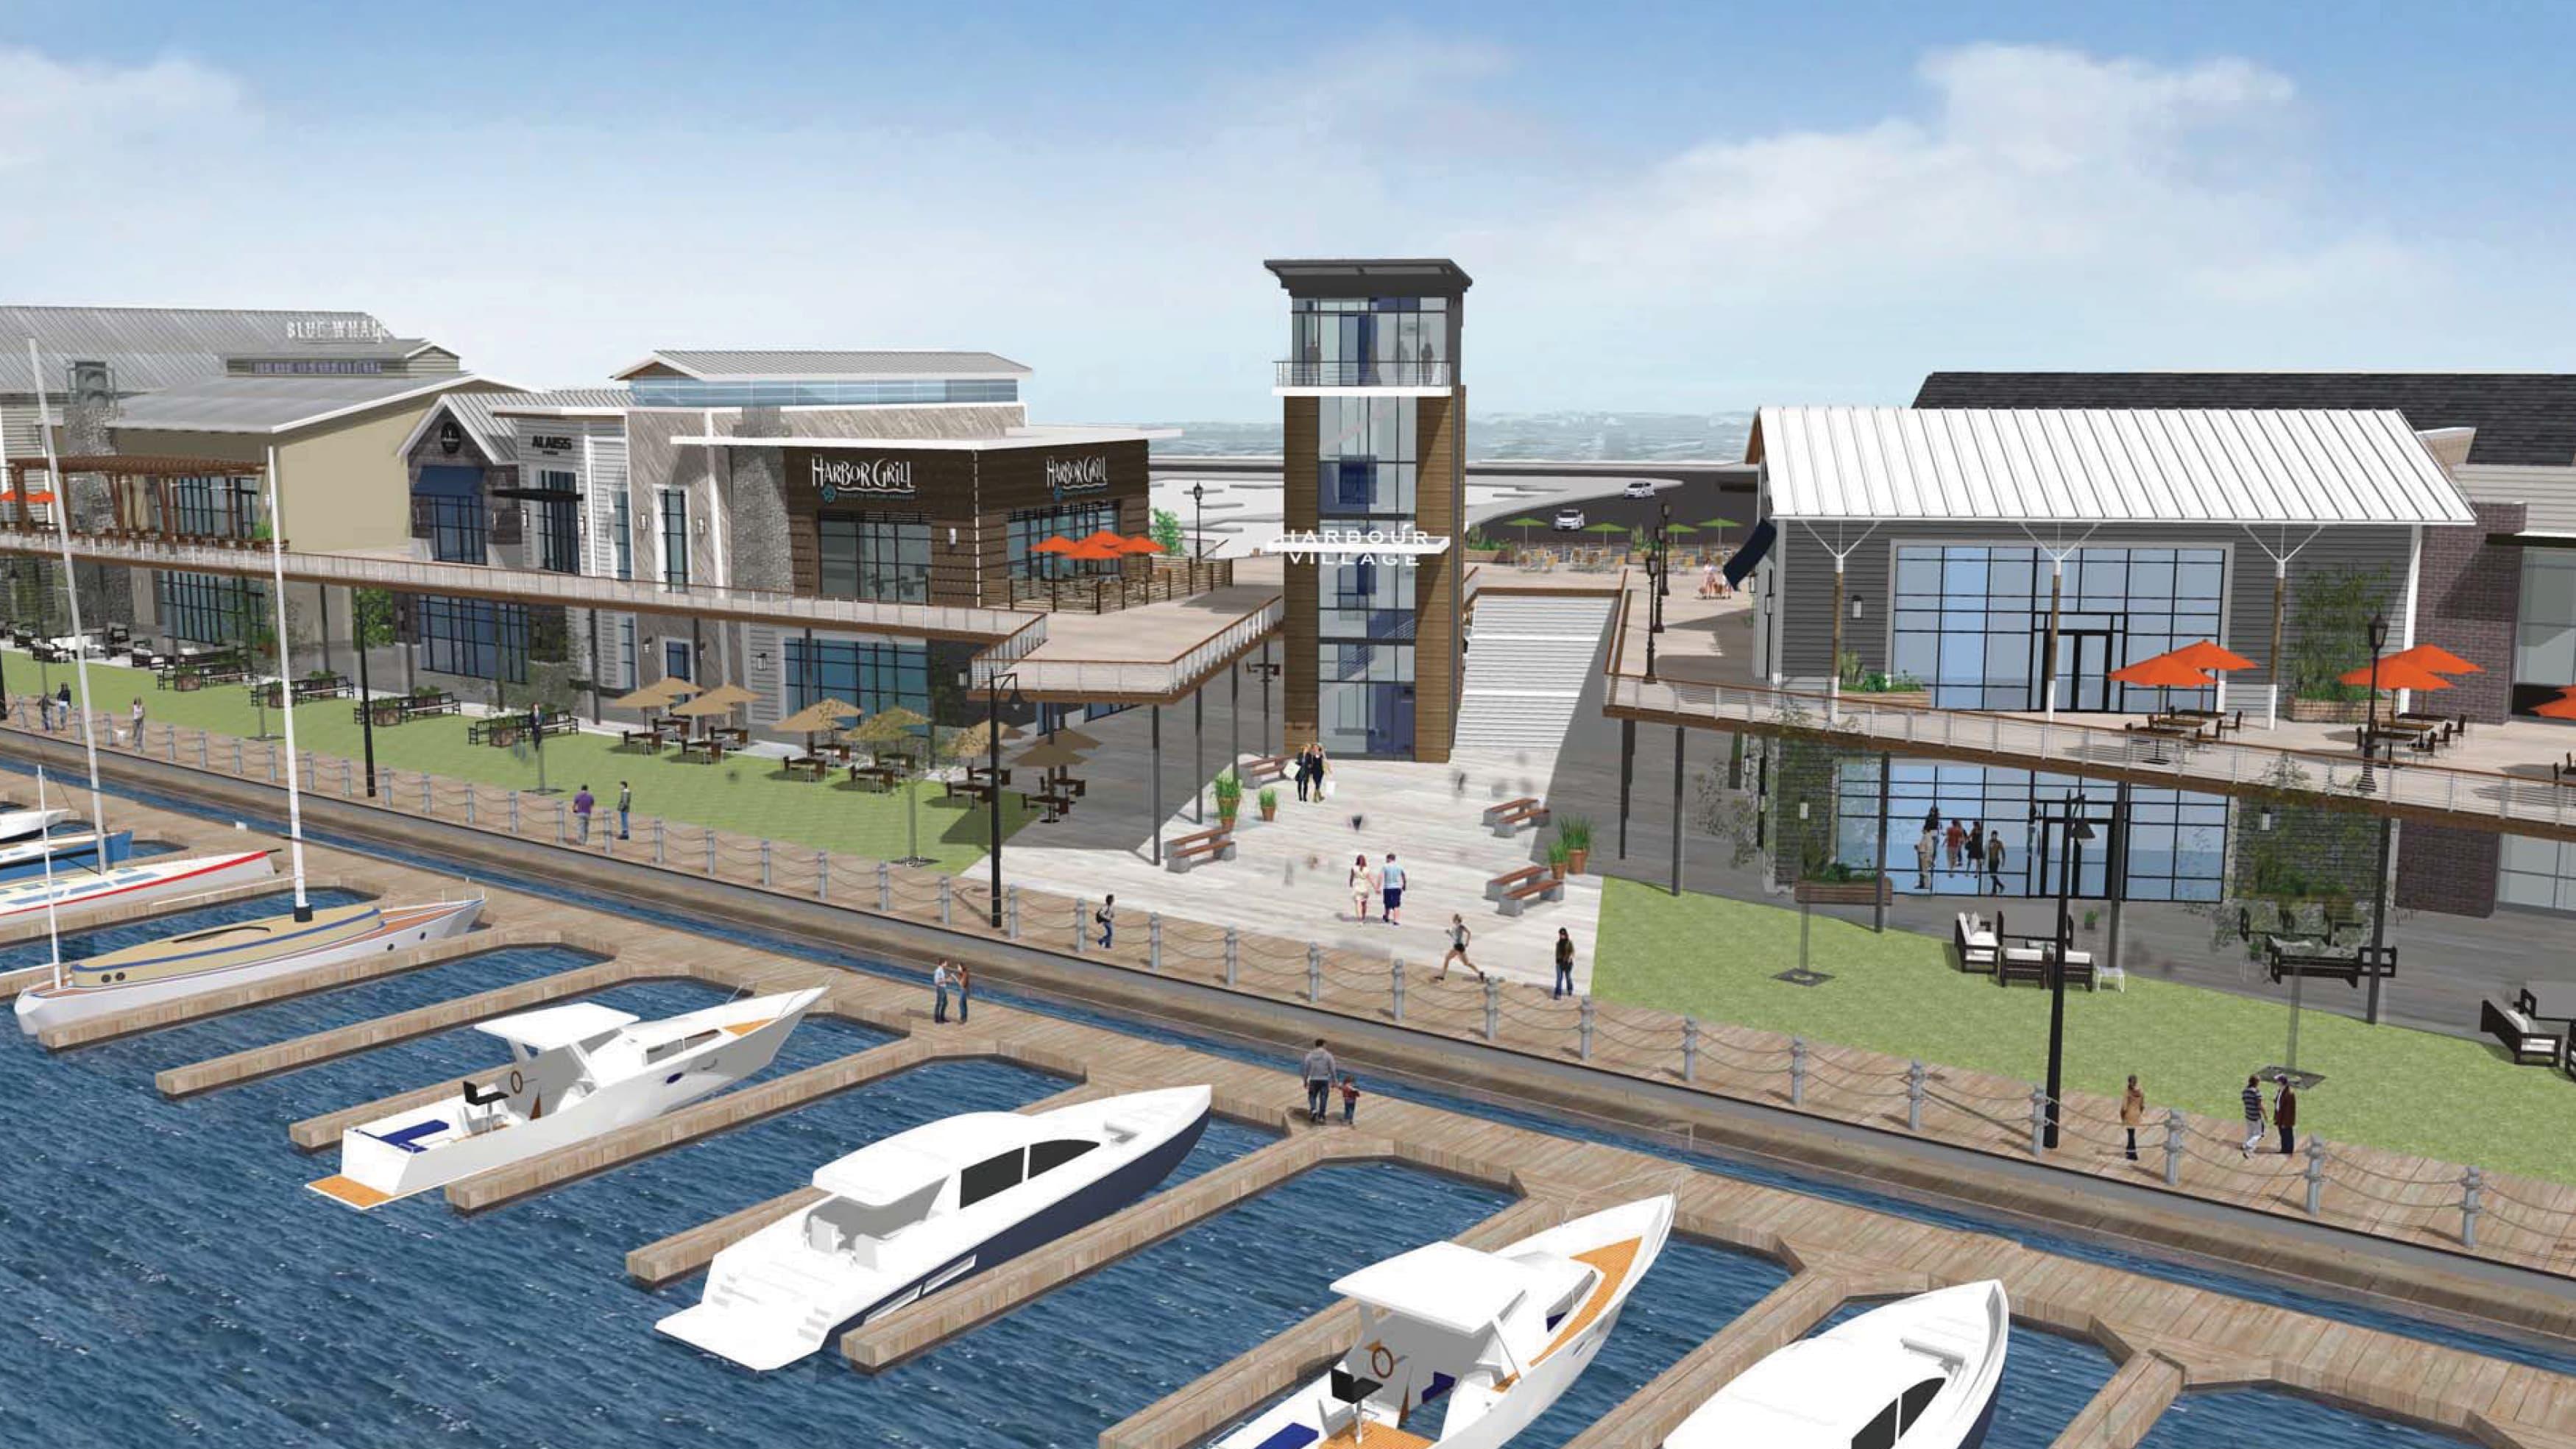 Rendering of Dana Point Harbor revitalized commercial core.